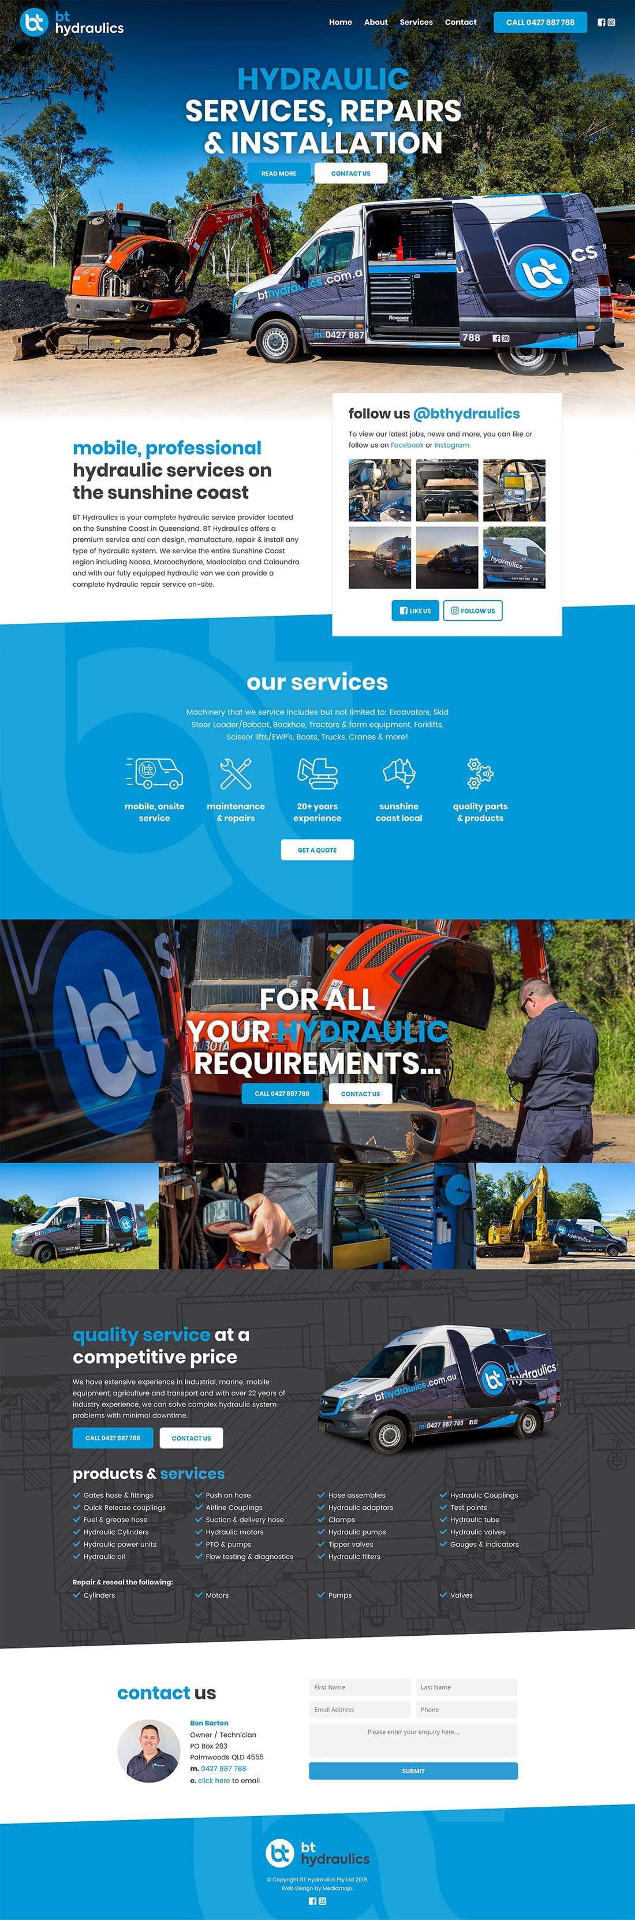 BT Hydraulics Website Design